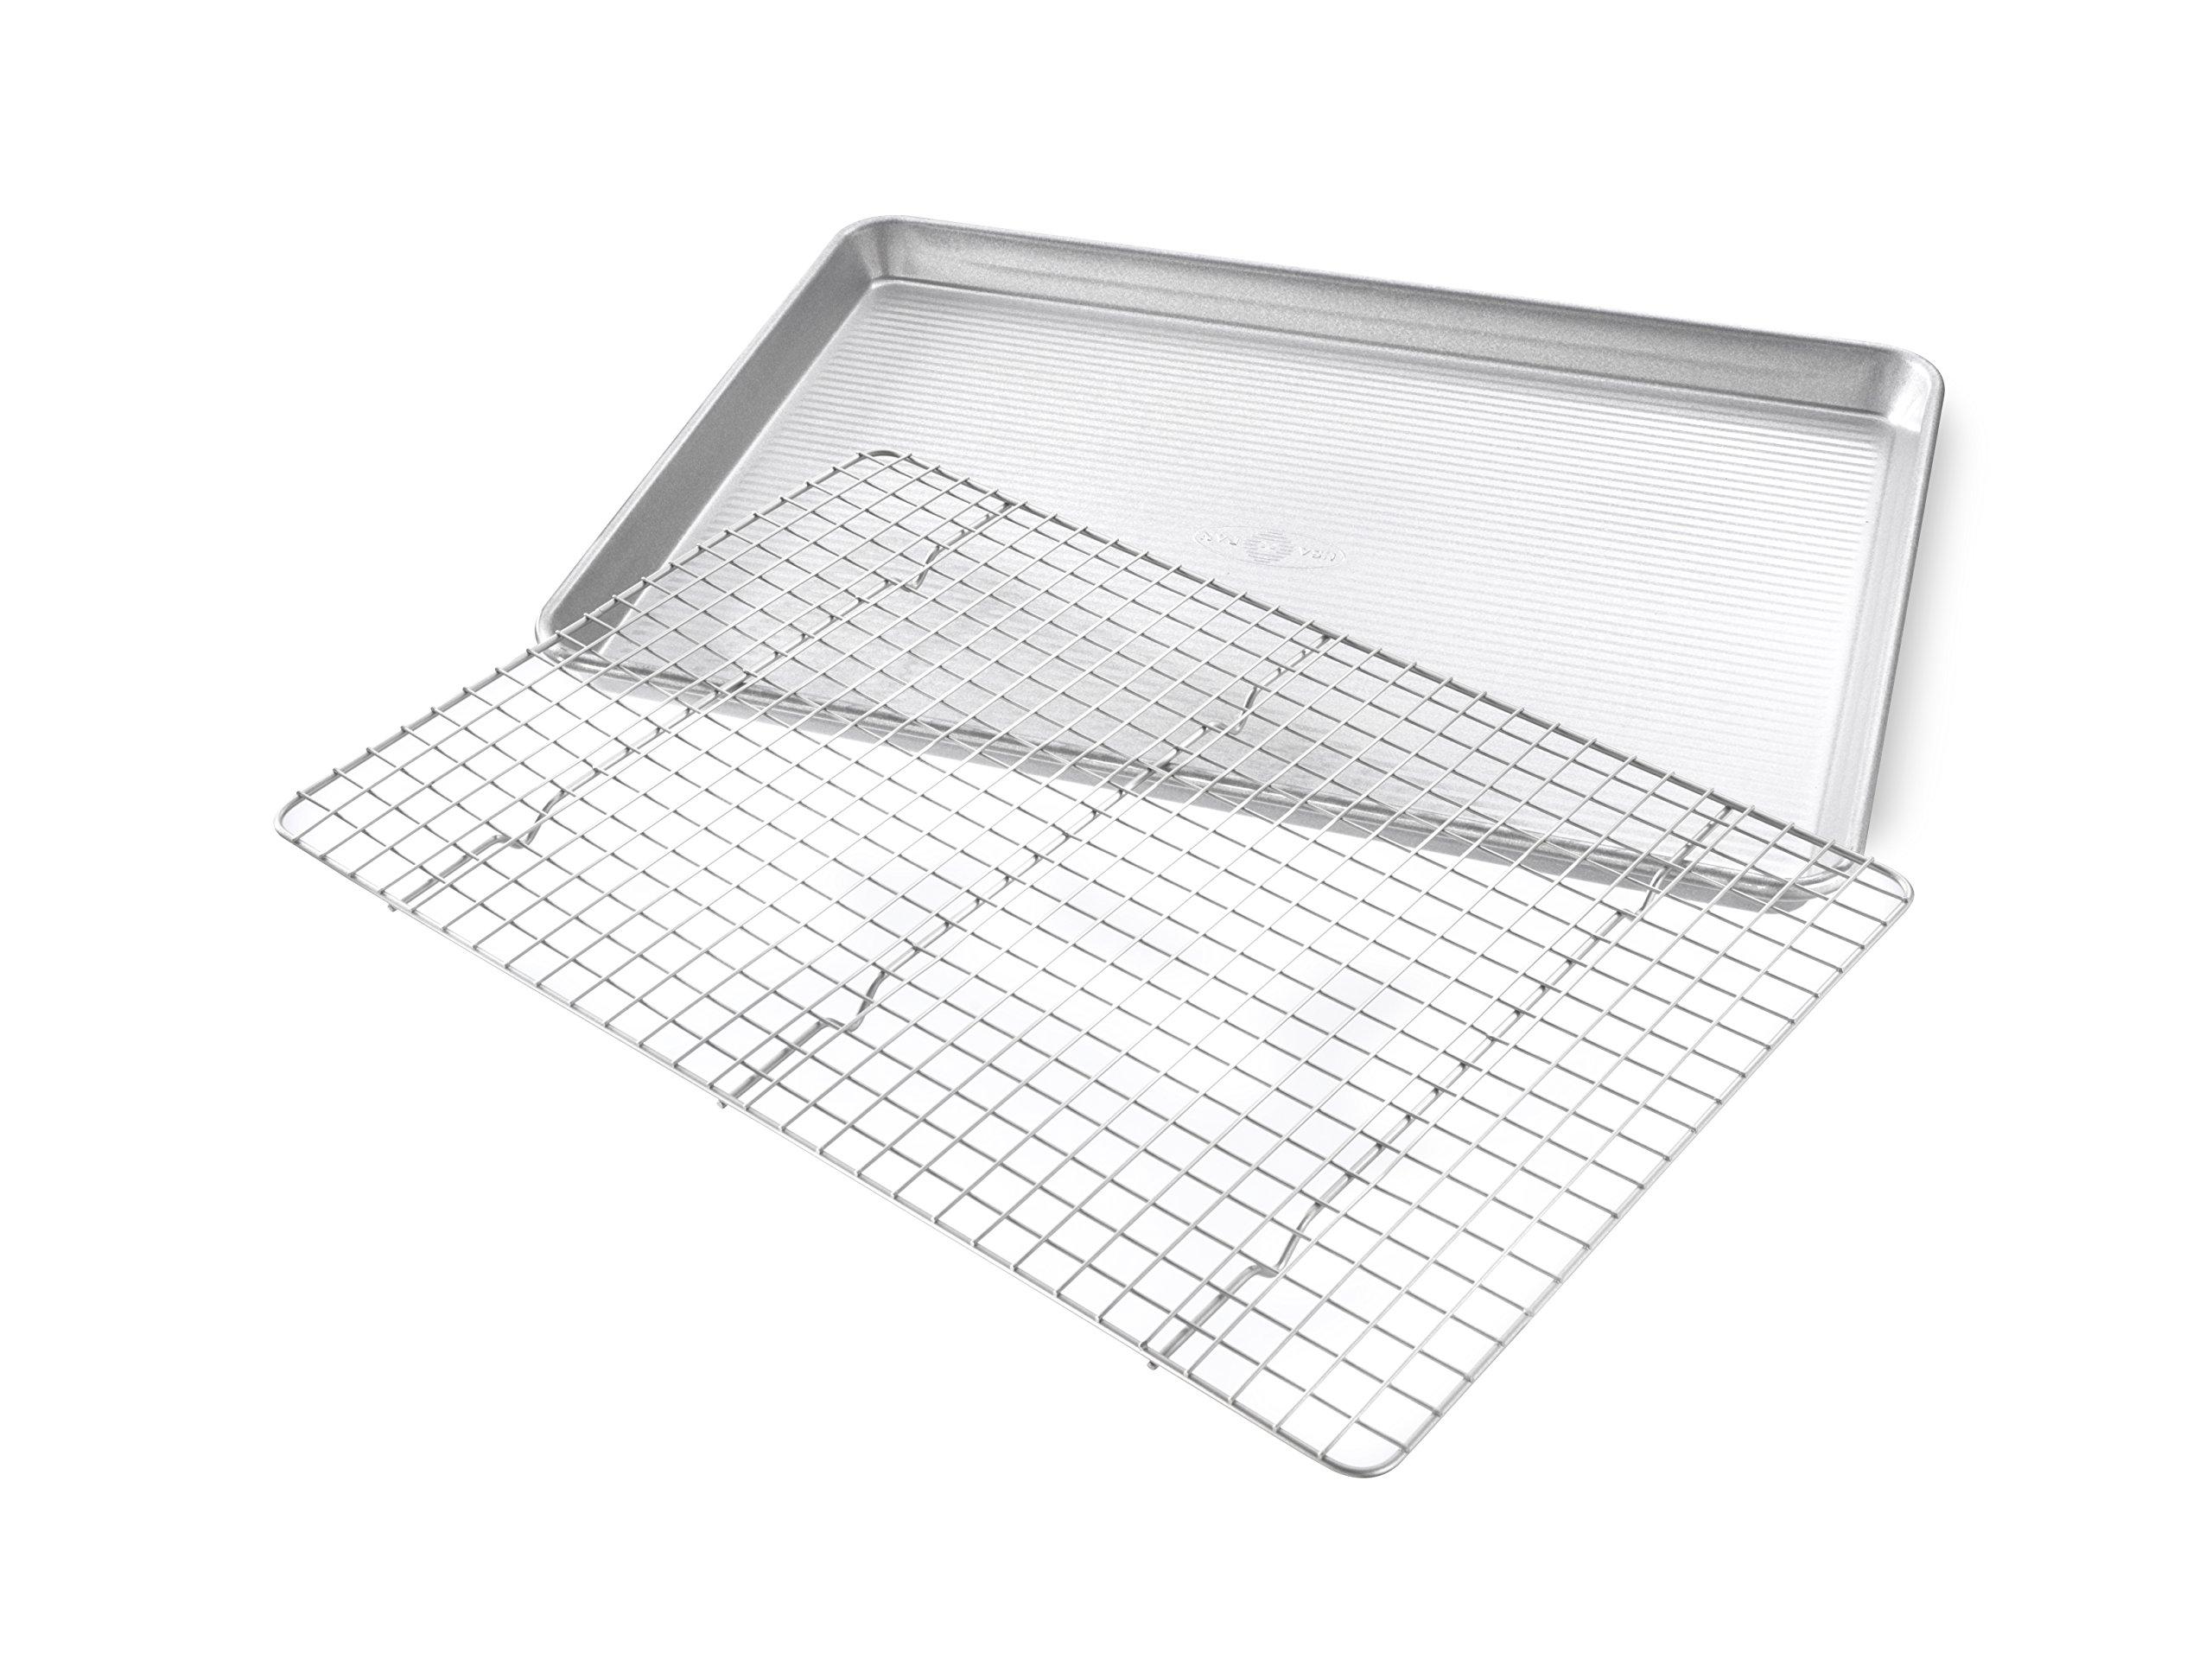 USA Pan 1606CR Half Sheet Baking Pan and Bakeable Nonstick Cooling Rack, Metal by USA Pan (Image #2)